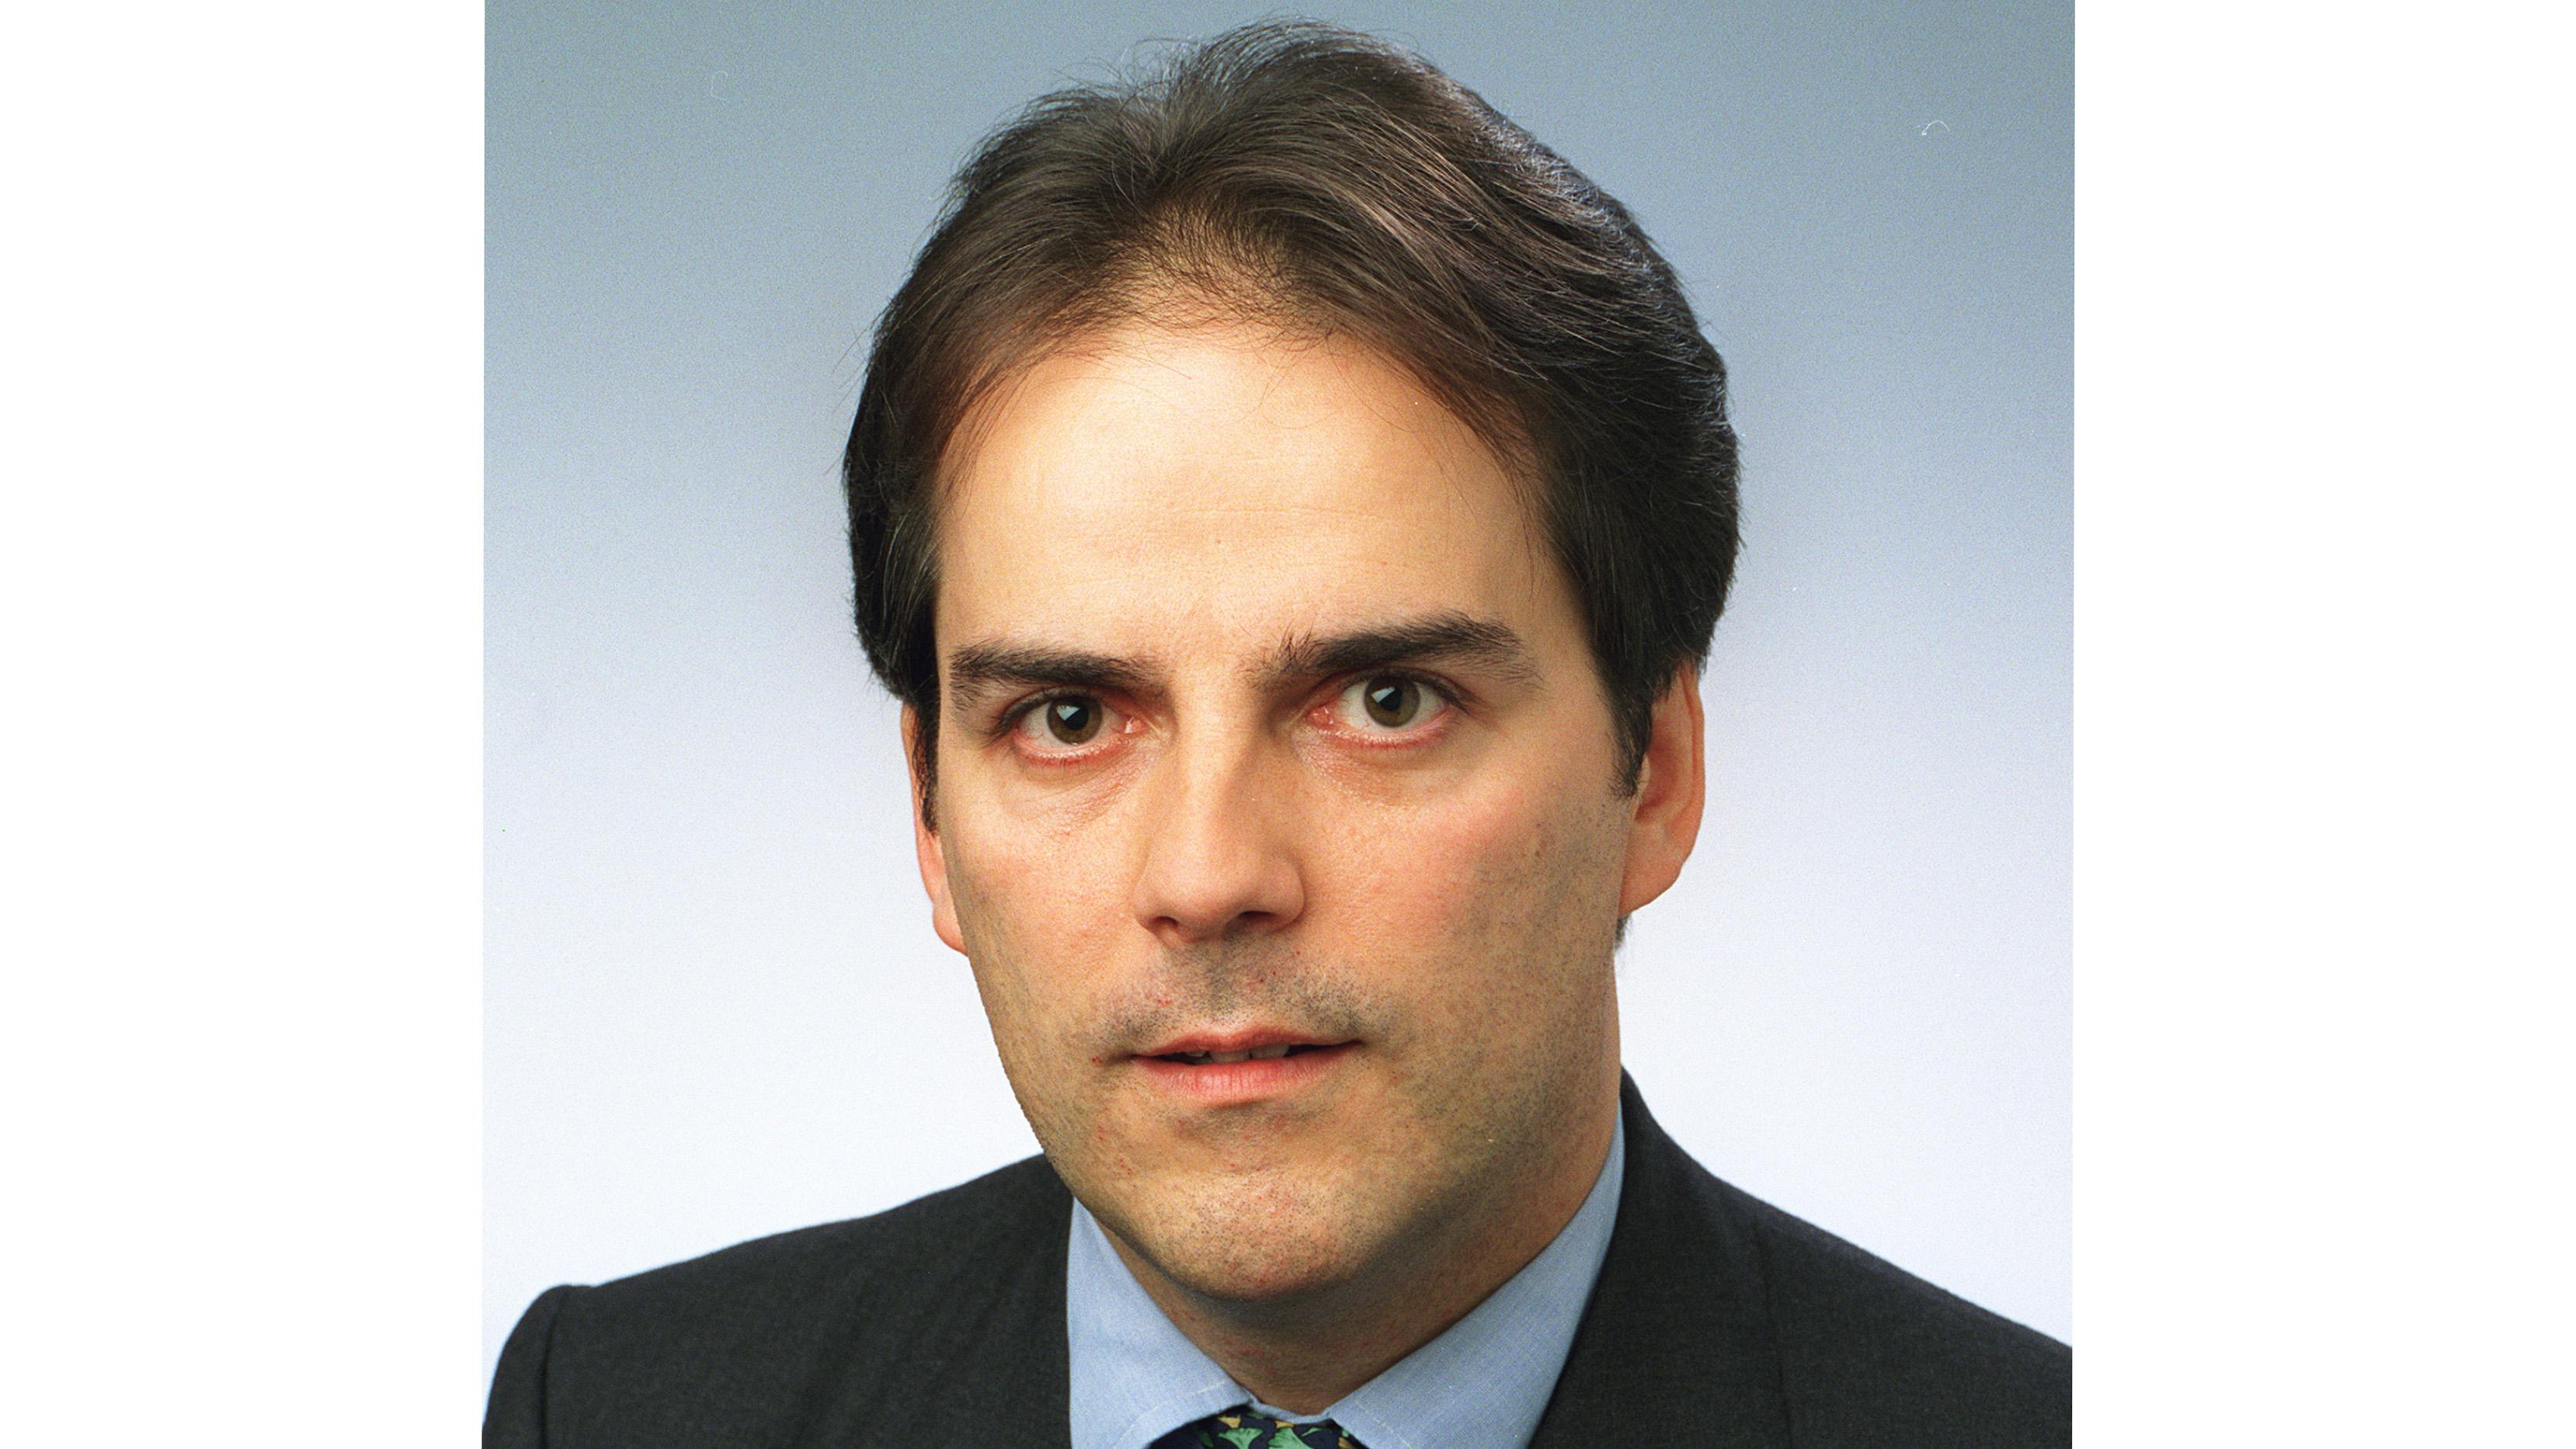 Mark Field MP (Getty)